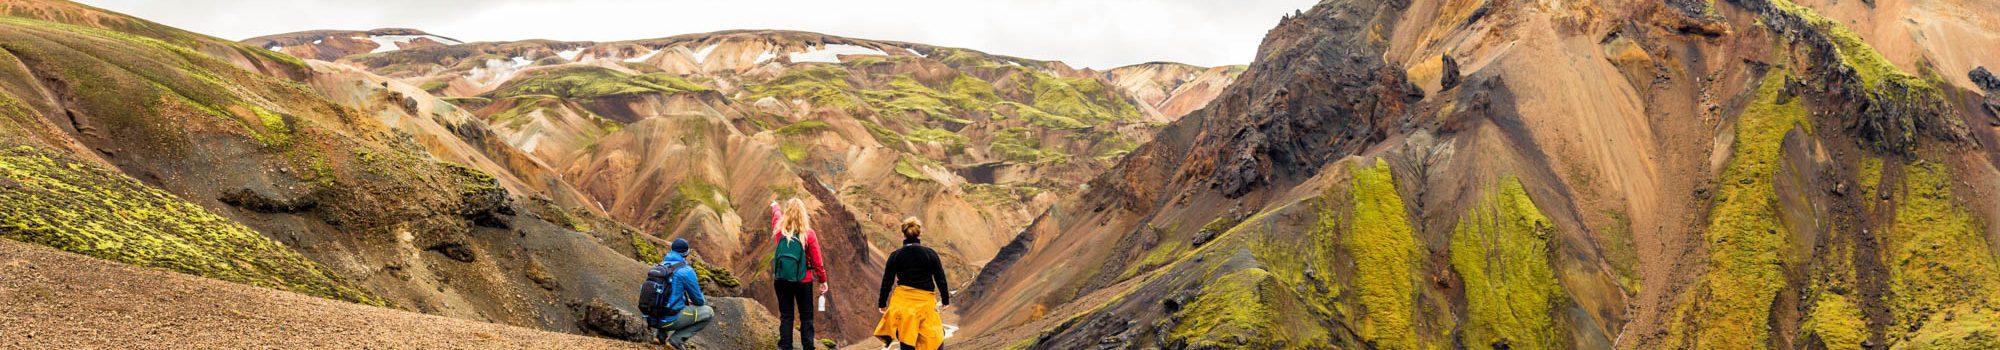 Landmannalaugar-tekking-trail-Iceland